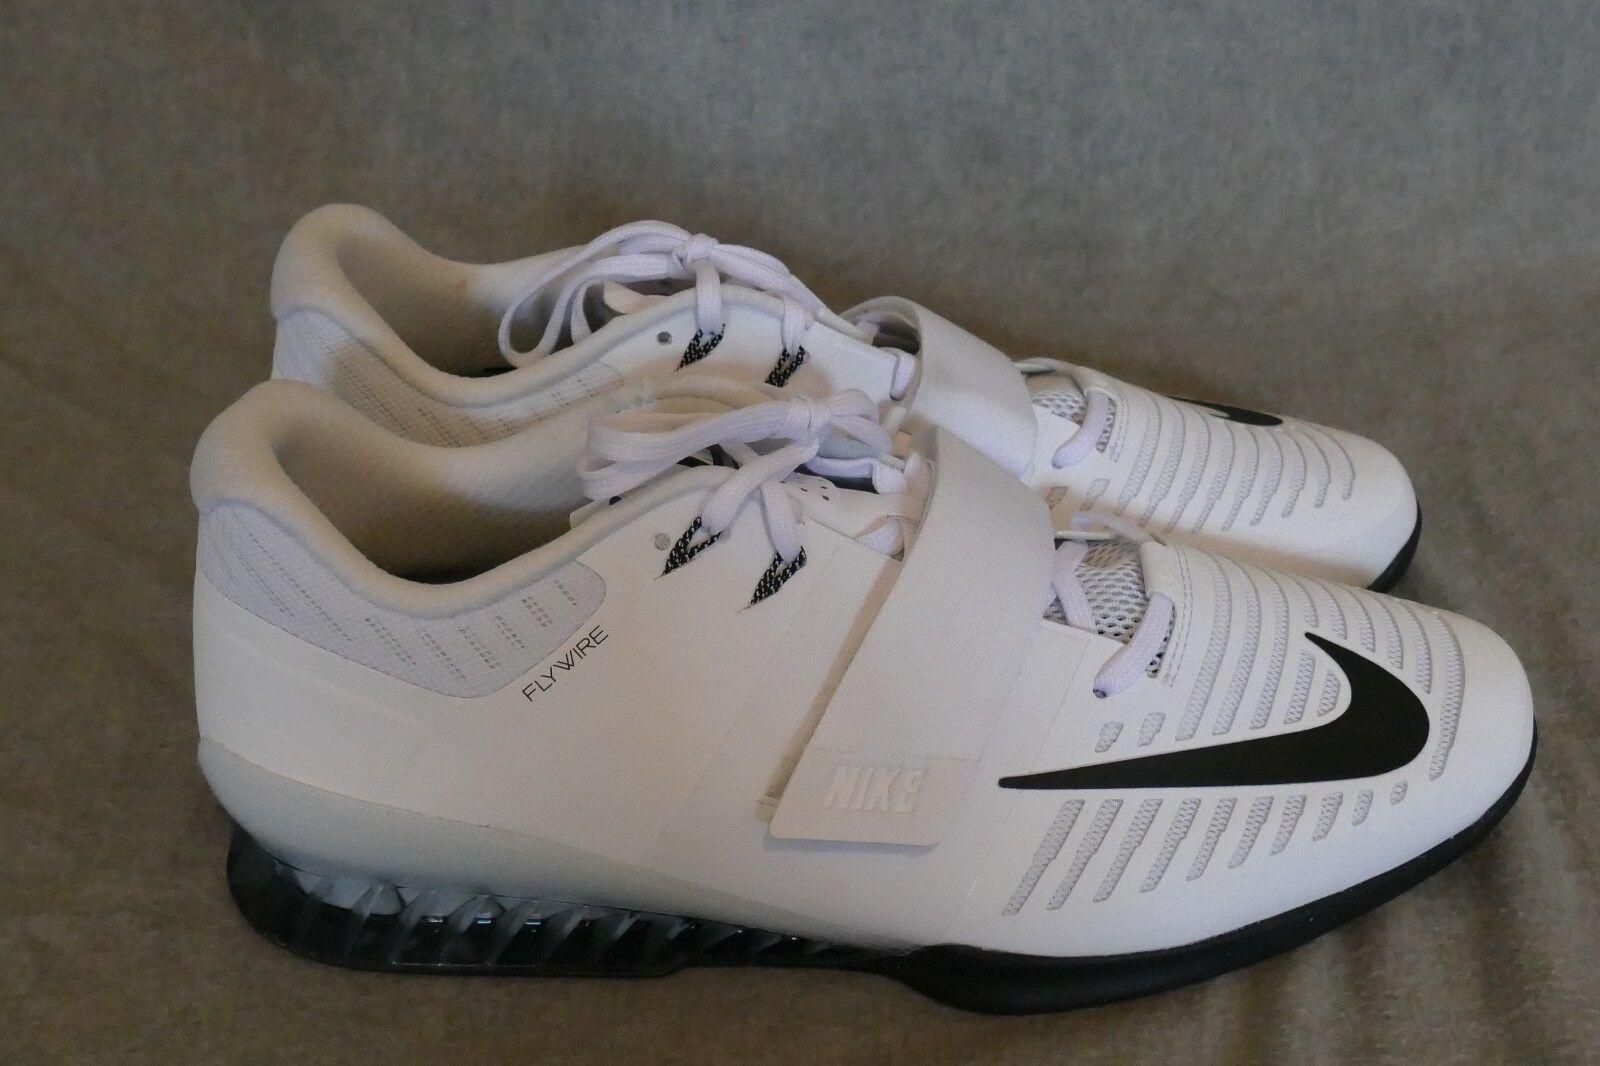 Nike Romaleos 3 Weightlifting Crossfit Training White Black 852933-100 Size 16